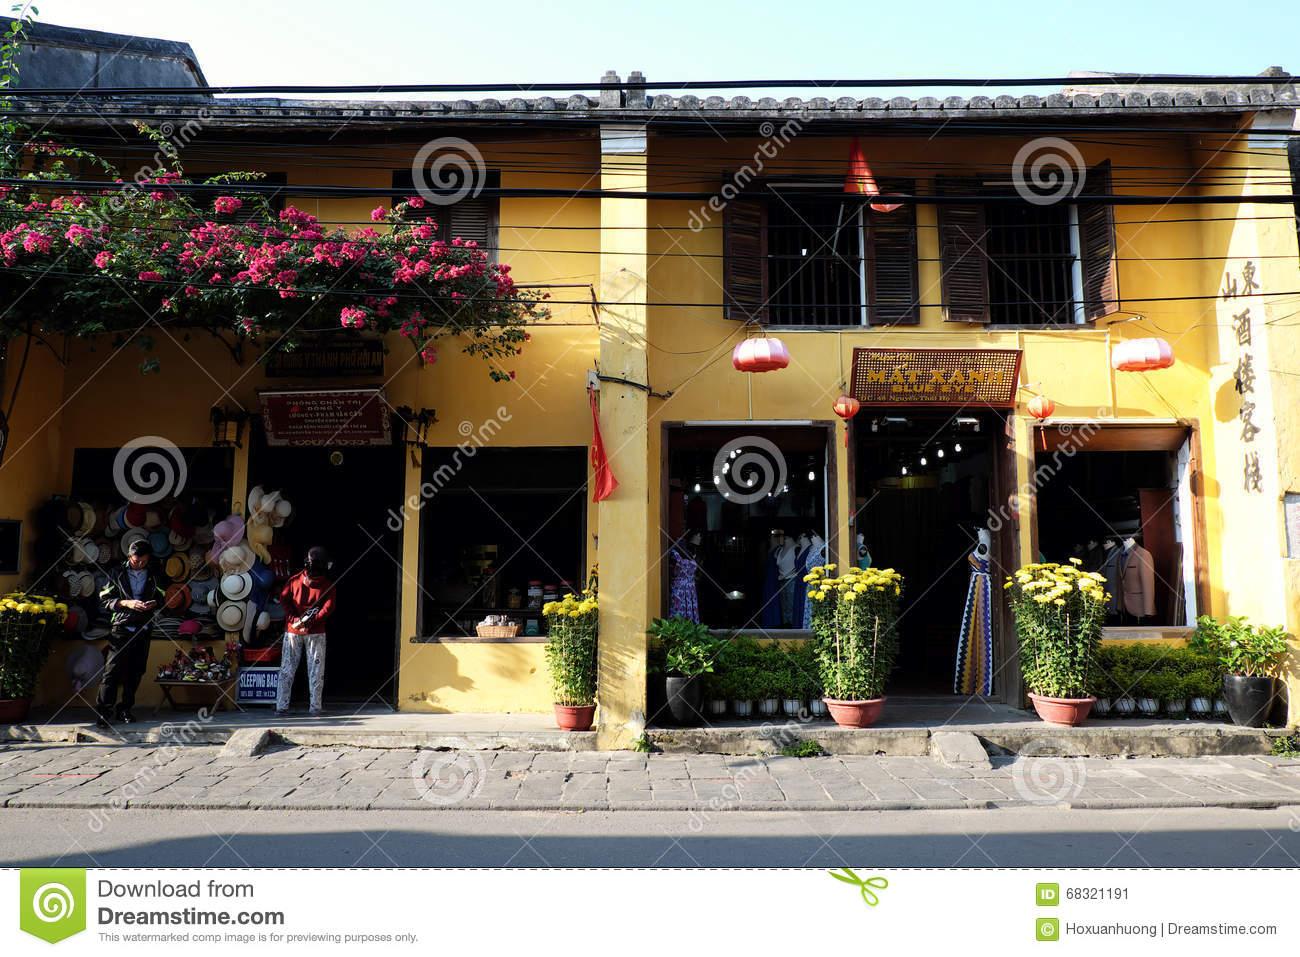 Hoi An, Hoian Old Town, Vietnam Travel Editorial Photo.